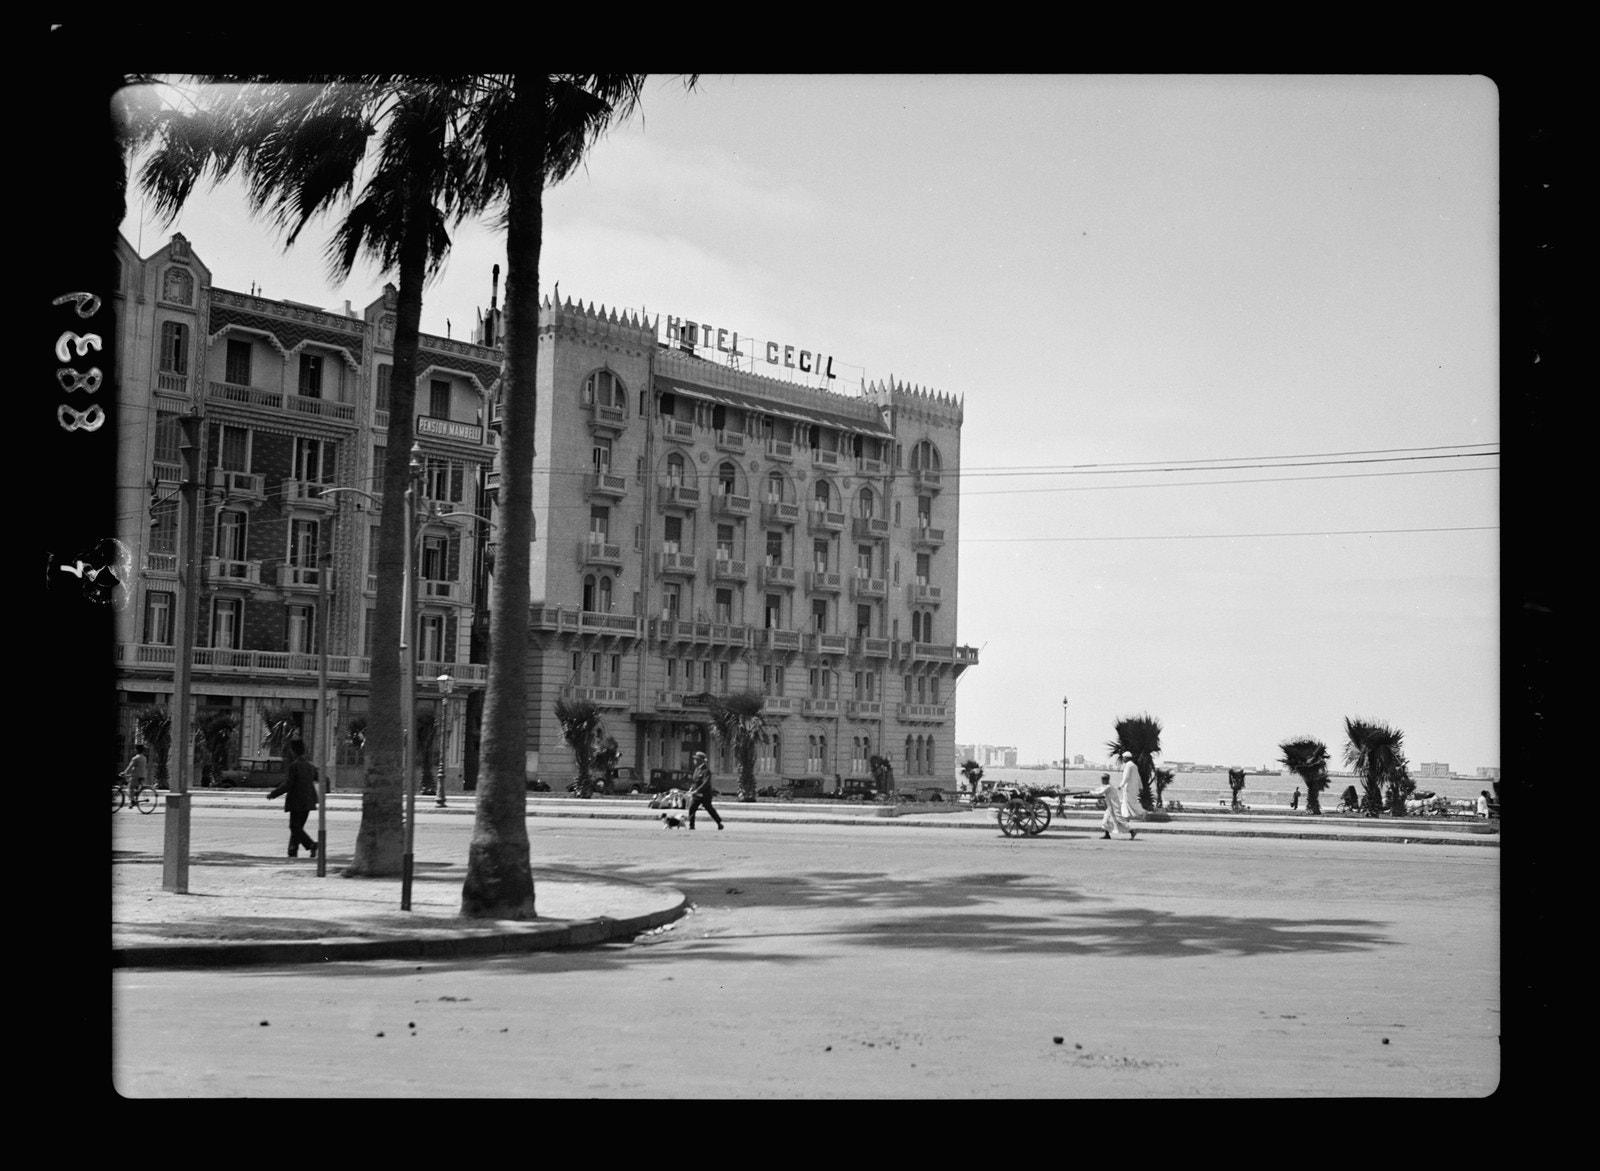 A hotel.